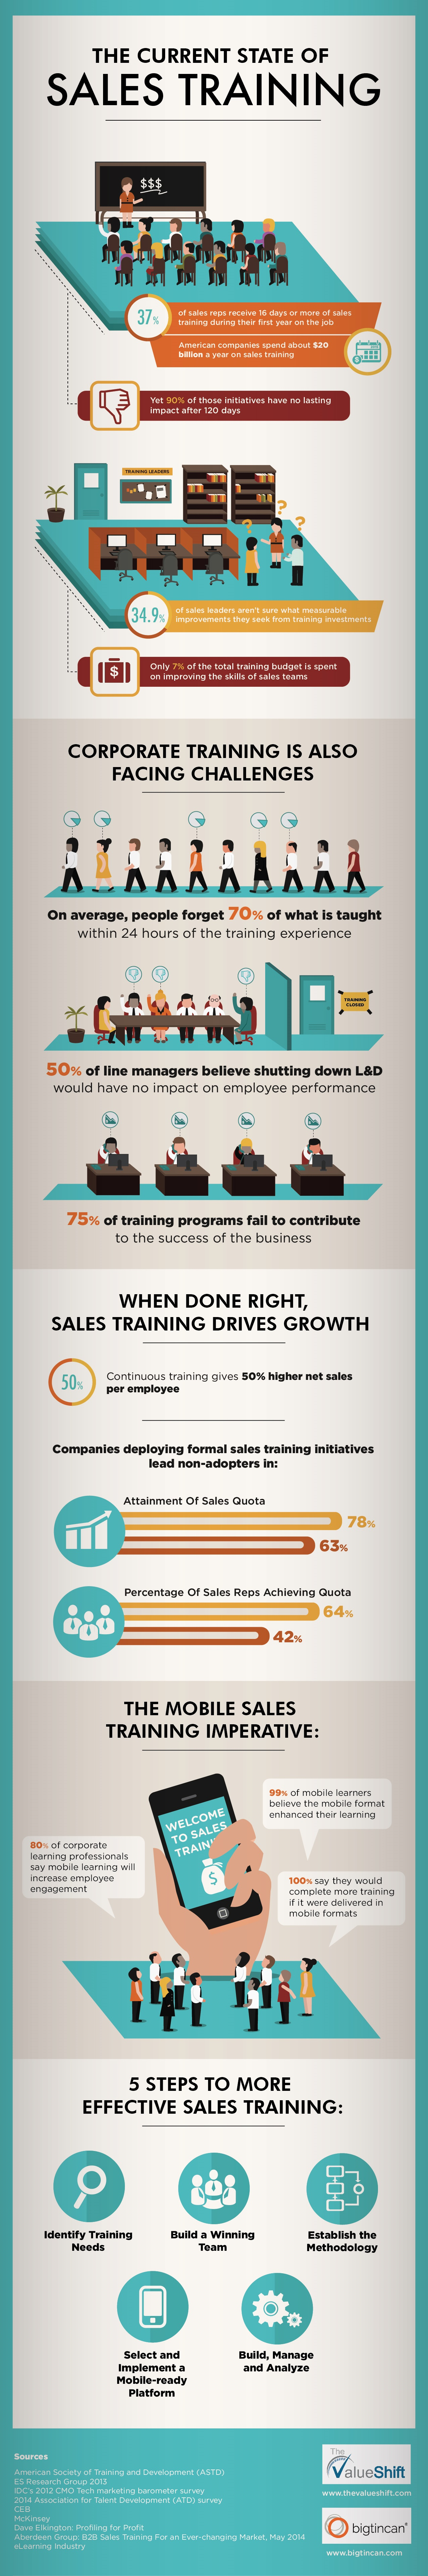 bigtincan-Infographic-State-of-Sales-Training-4-15.jpg